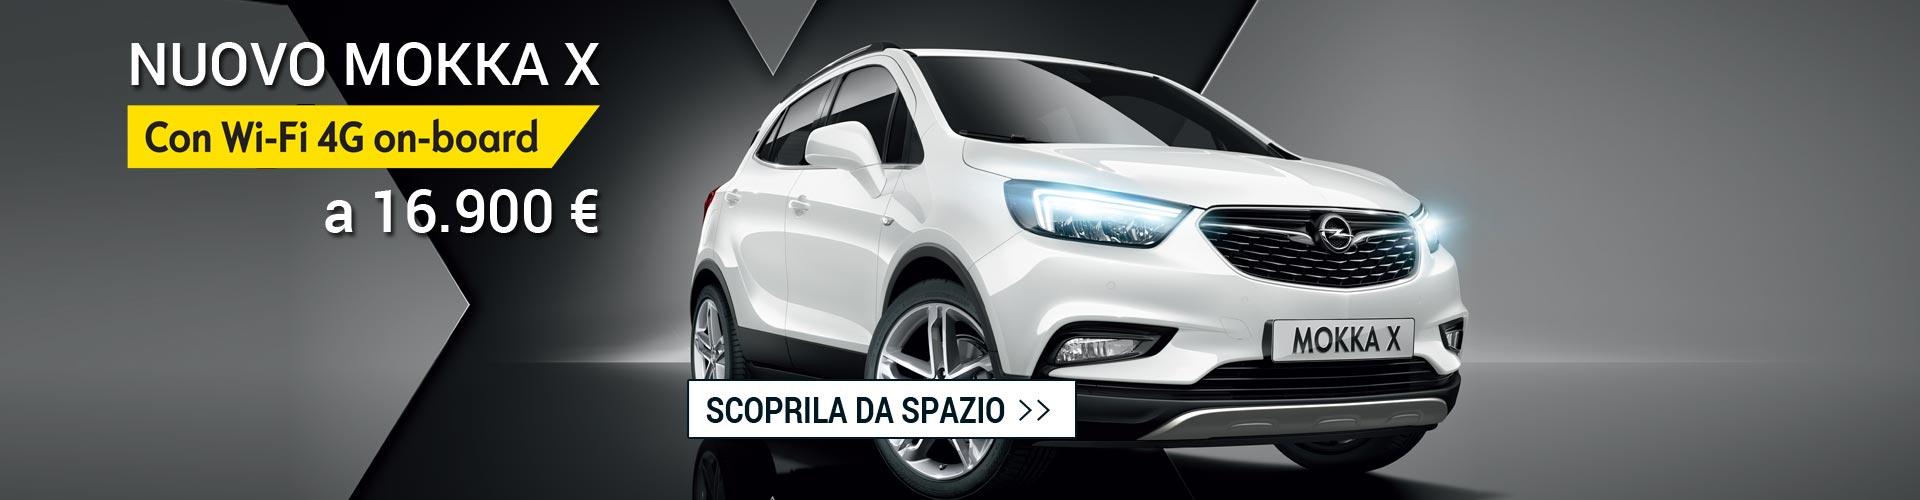 Opel mokkax Wifi da Spazio a Torino